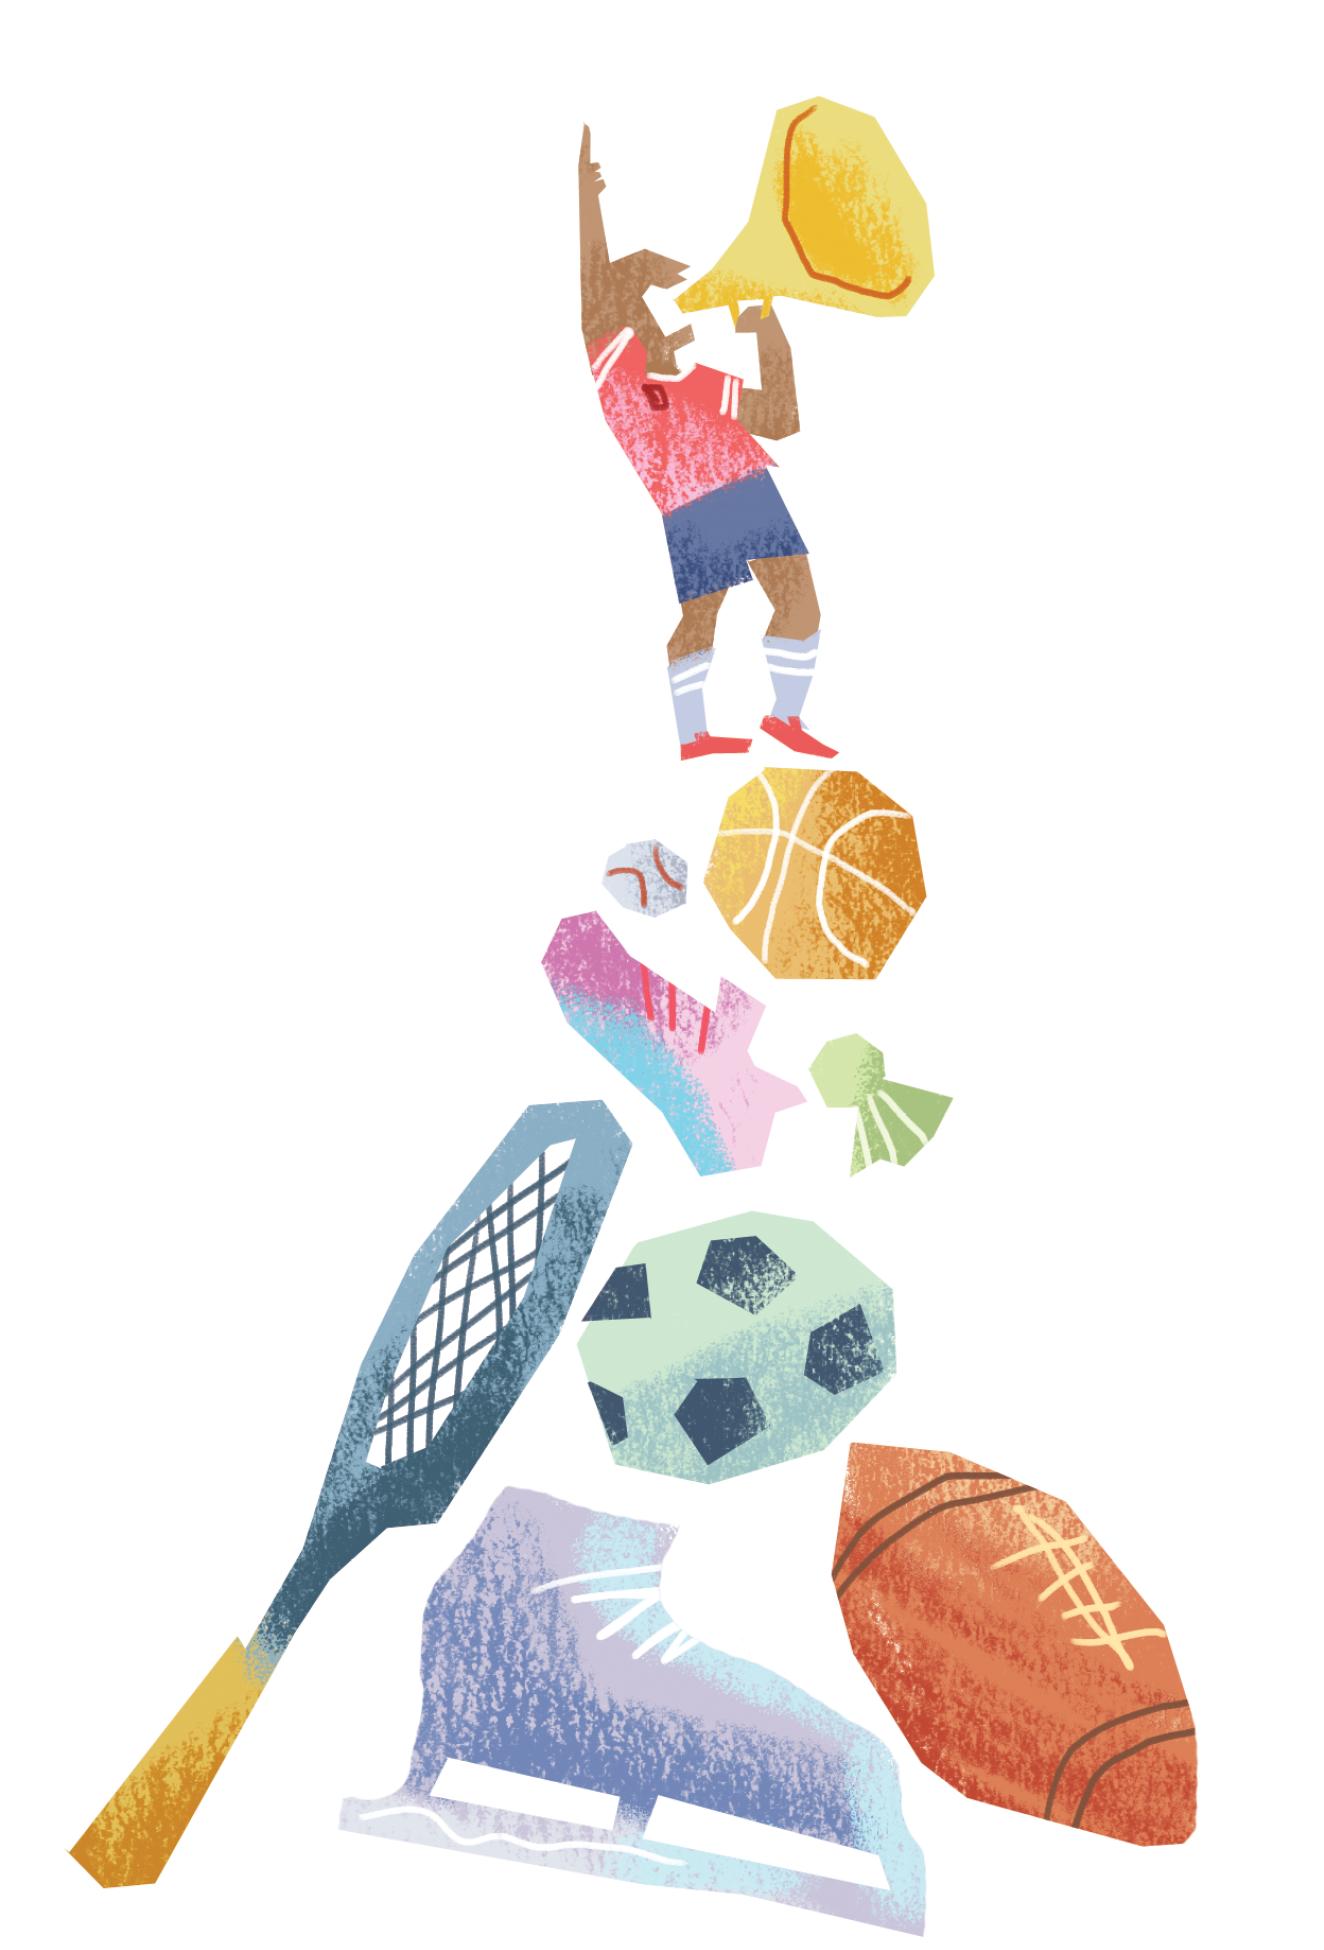 Illustration by Skye Ali